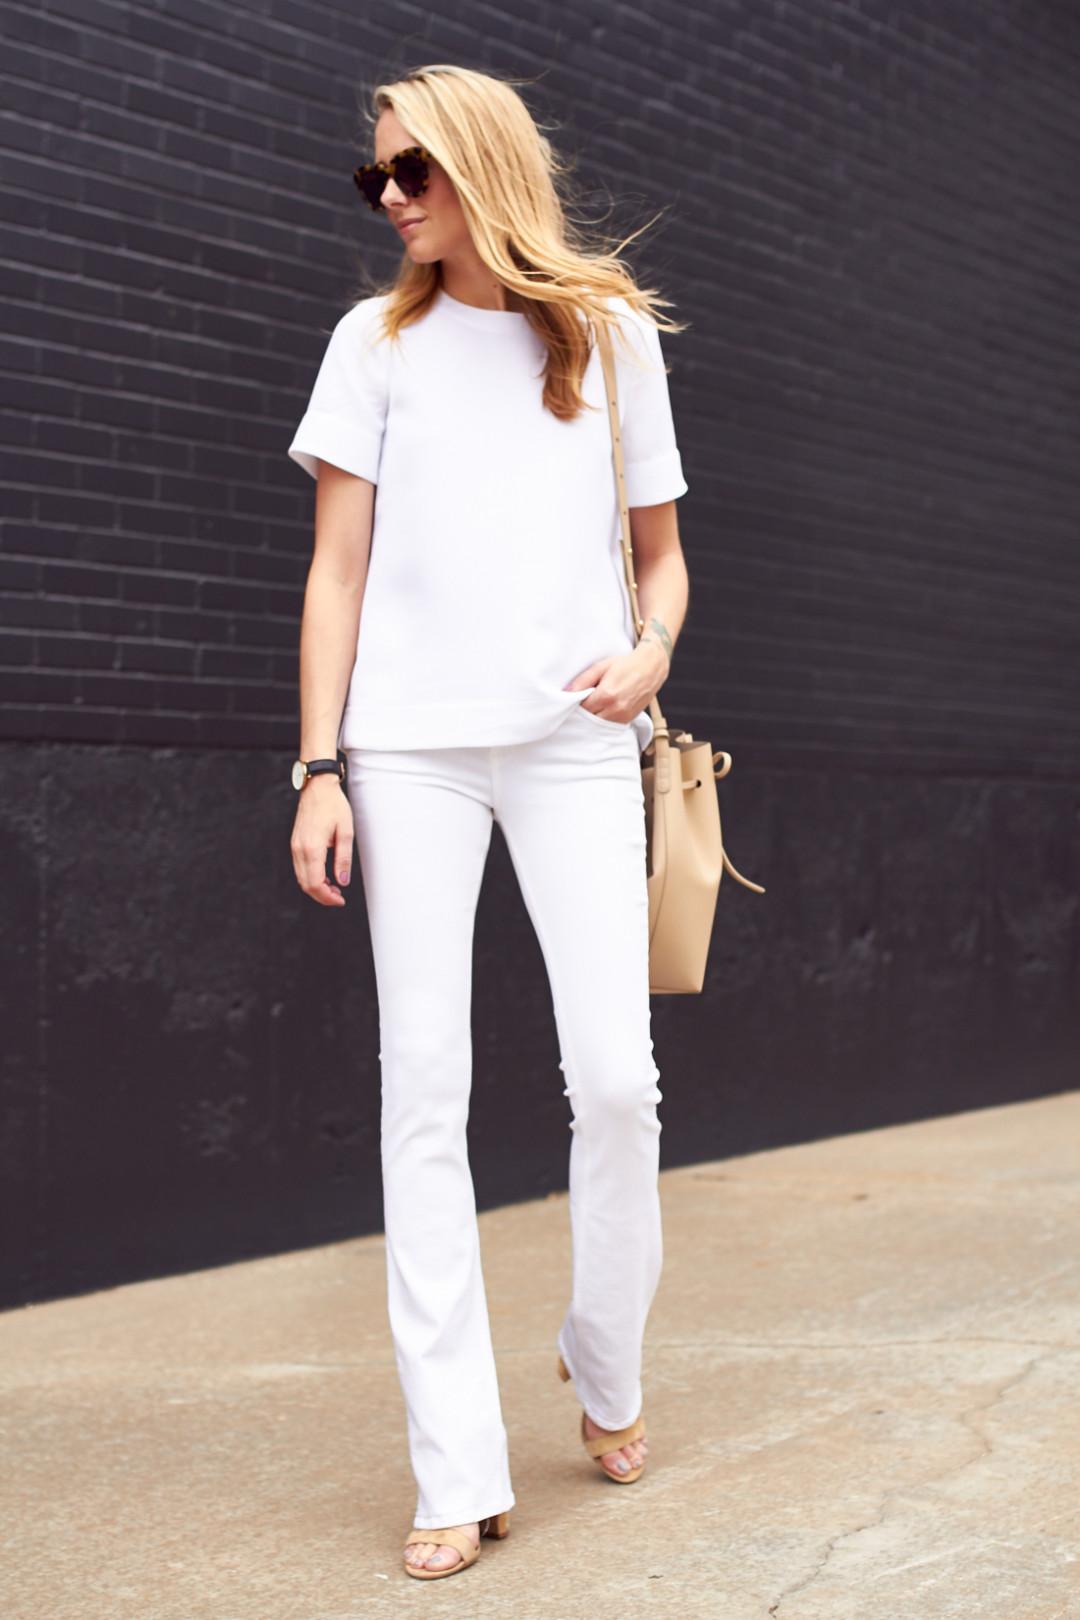 fashion-jackson-rag-and-bone-white-bootcut-jeans-white-short-sleeve-top